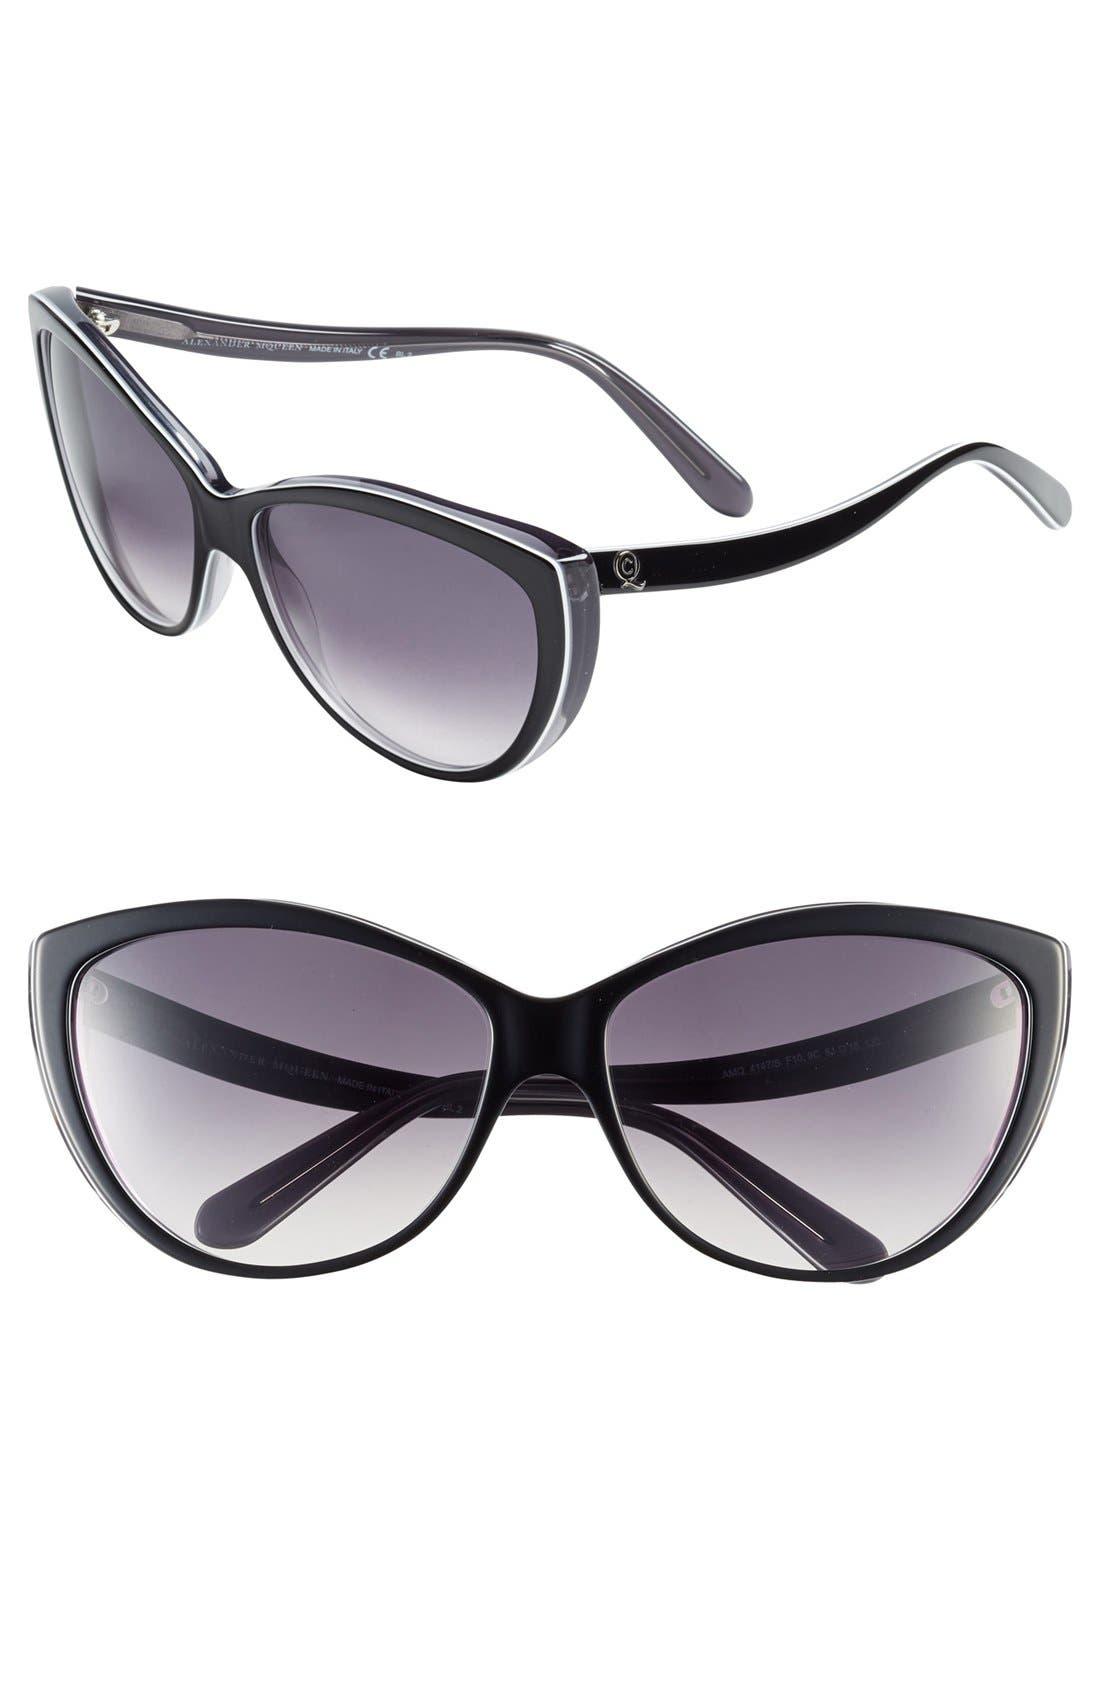 Alternate Image 1 Selected - Alexander McQueen 61mm Two-Tone Cat Eye Sunglasses